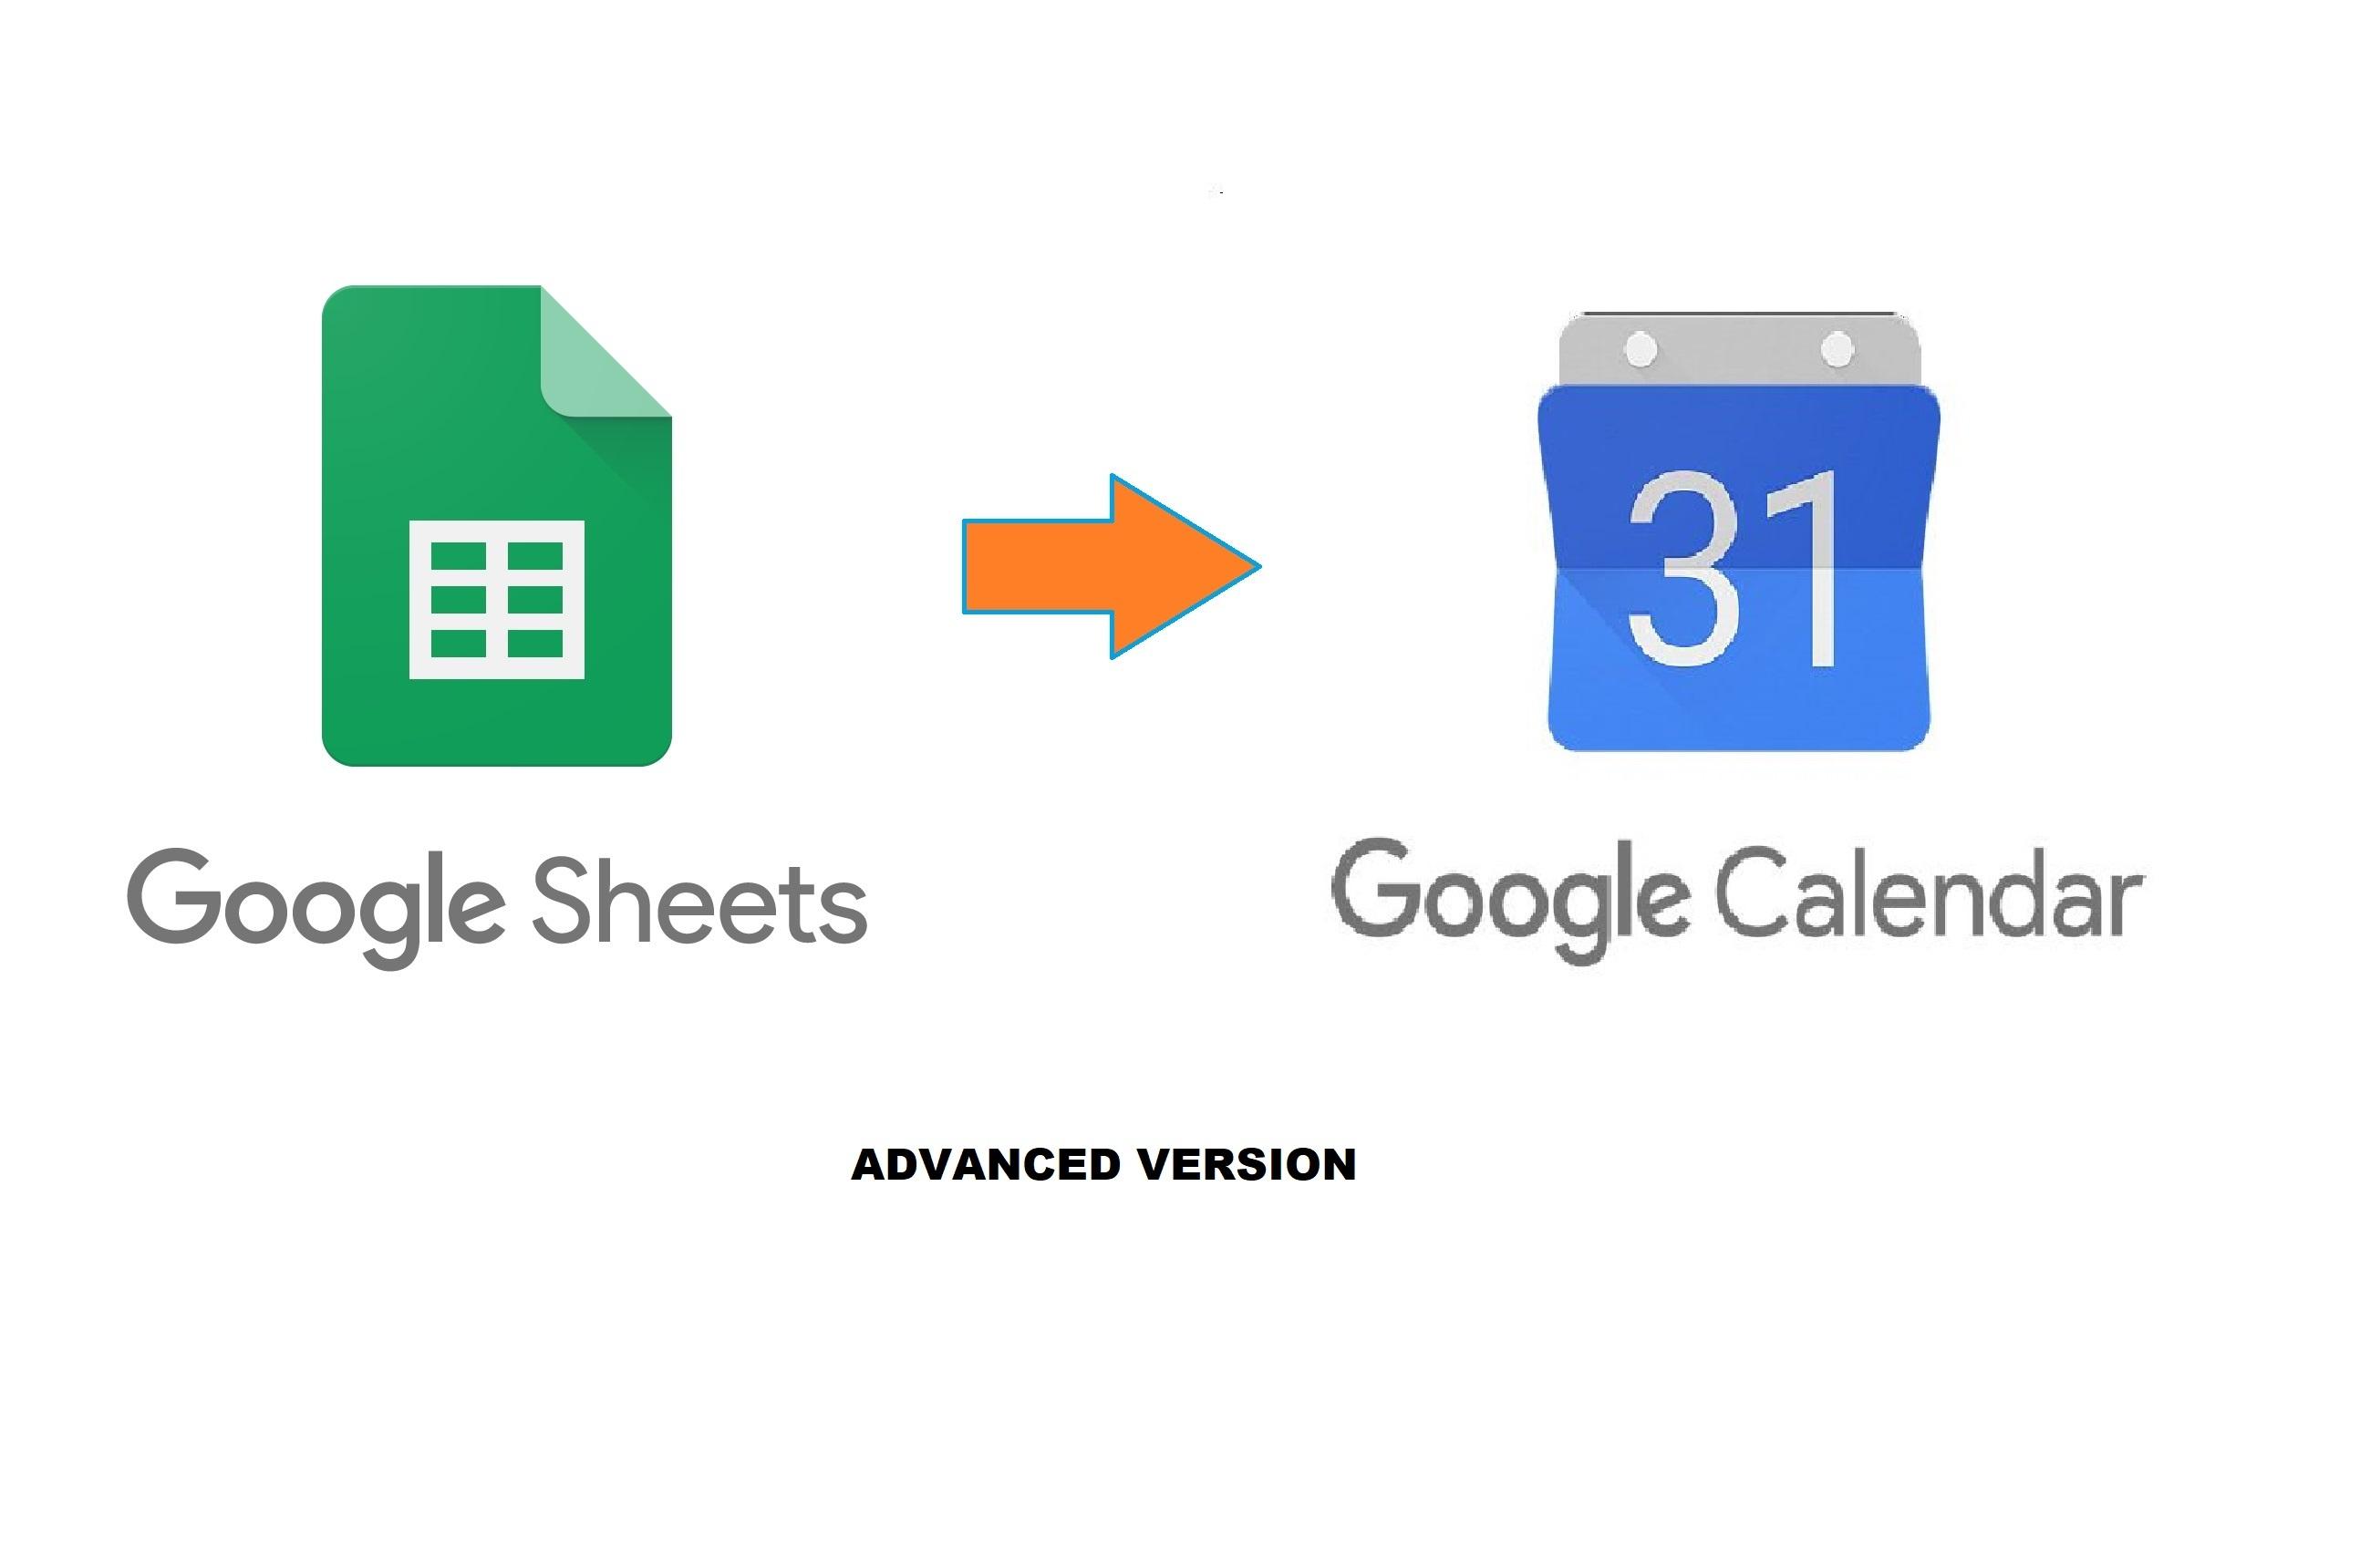 Google Sheet to Google Calendar Advanced